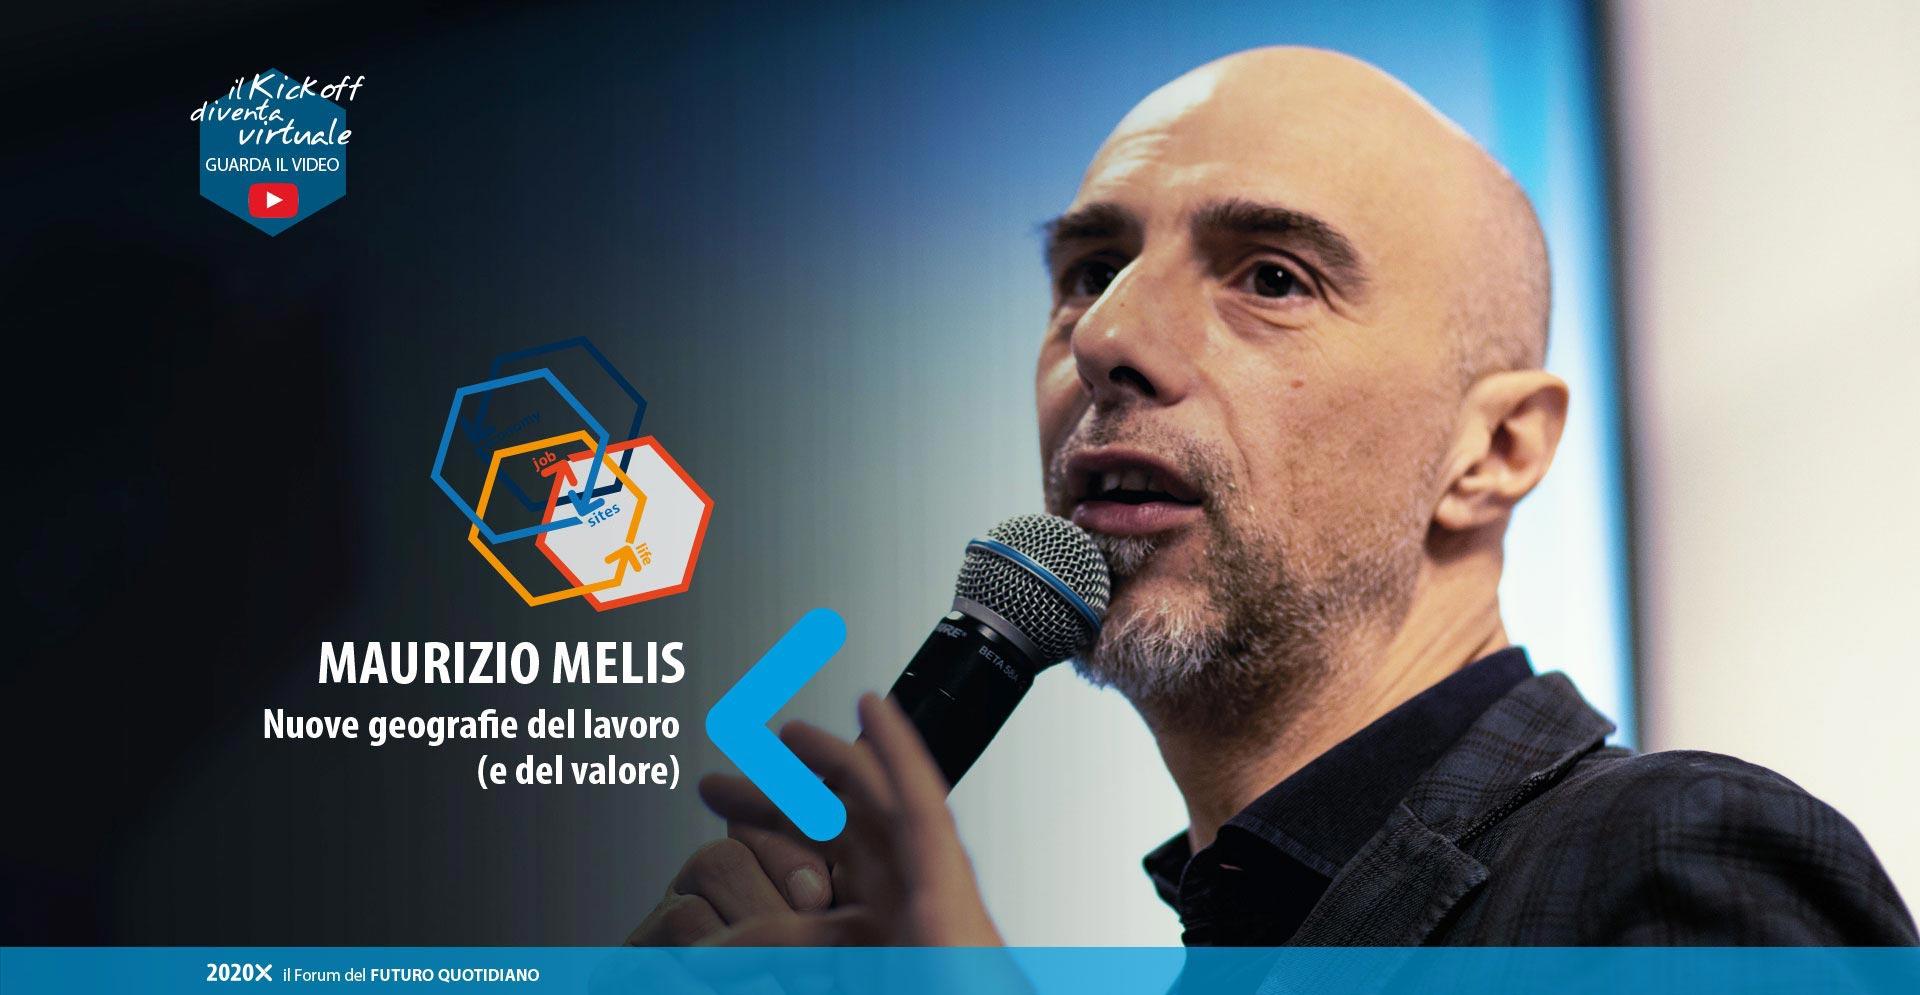 Maurizio Melis - kick off 13 marzo 2020